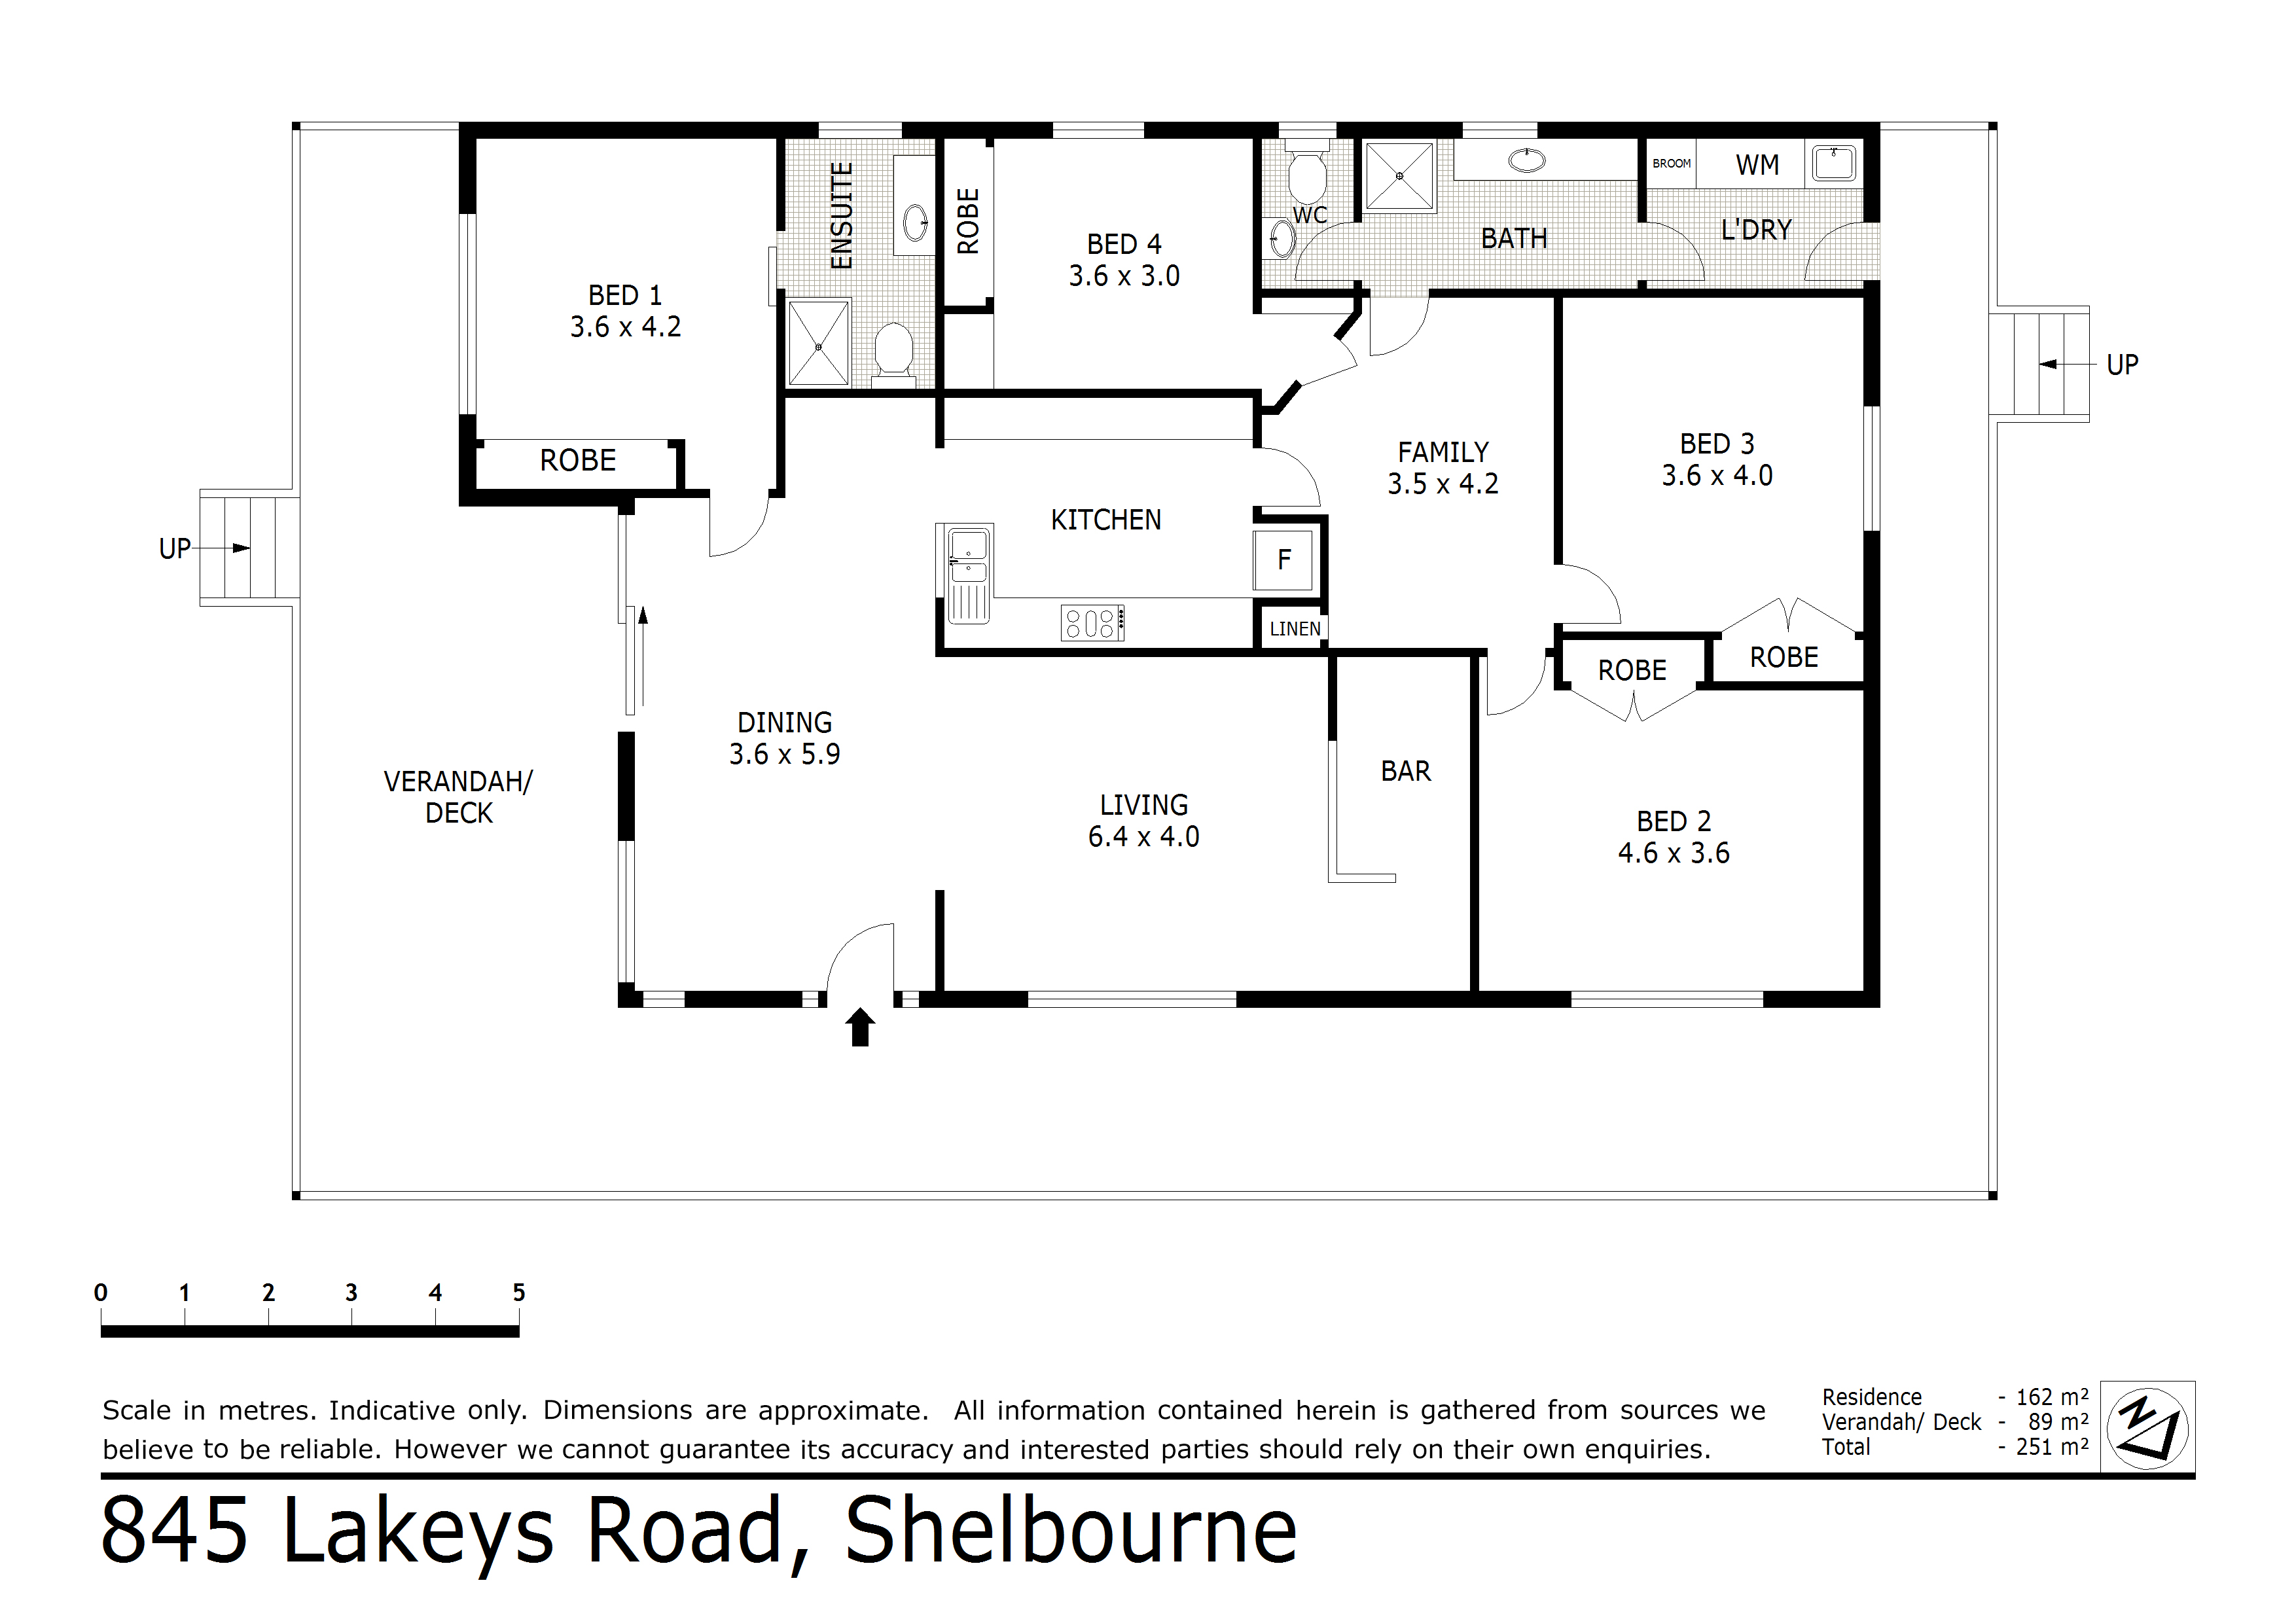 845 Lakeys Road, Shelbourne, VIC 3515